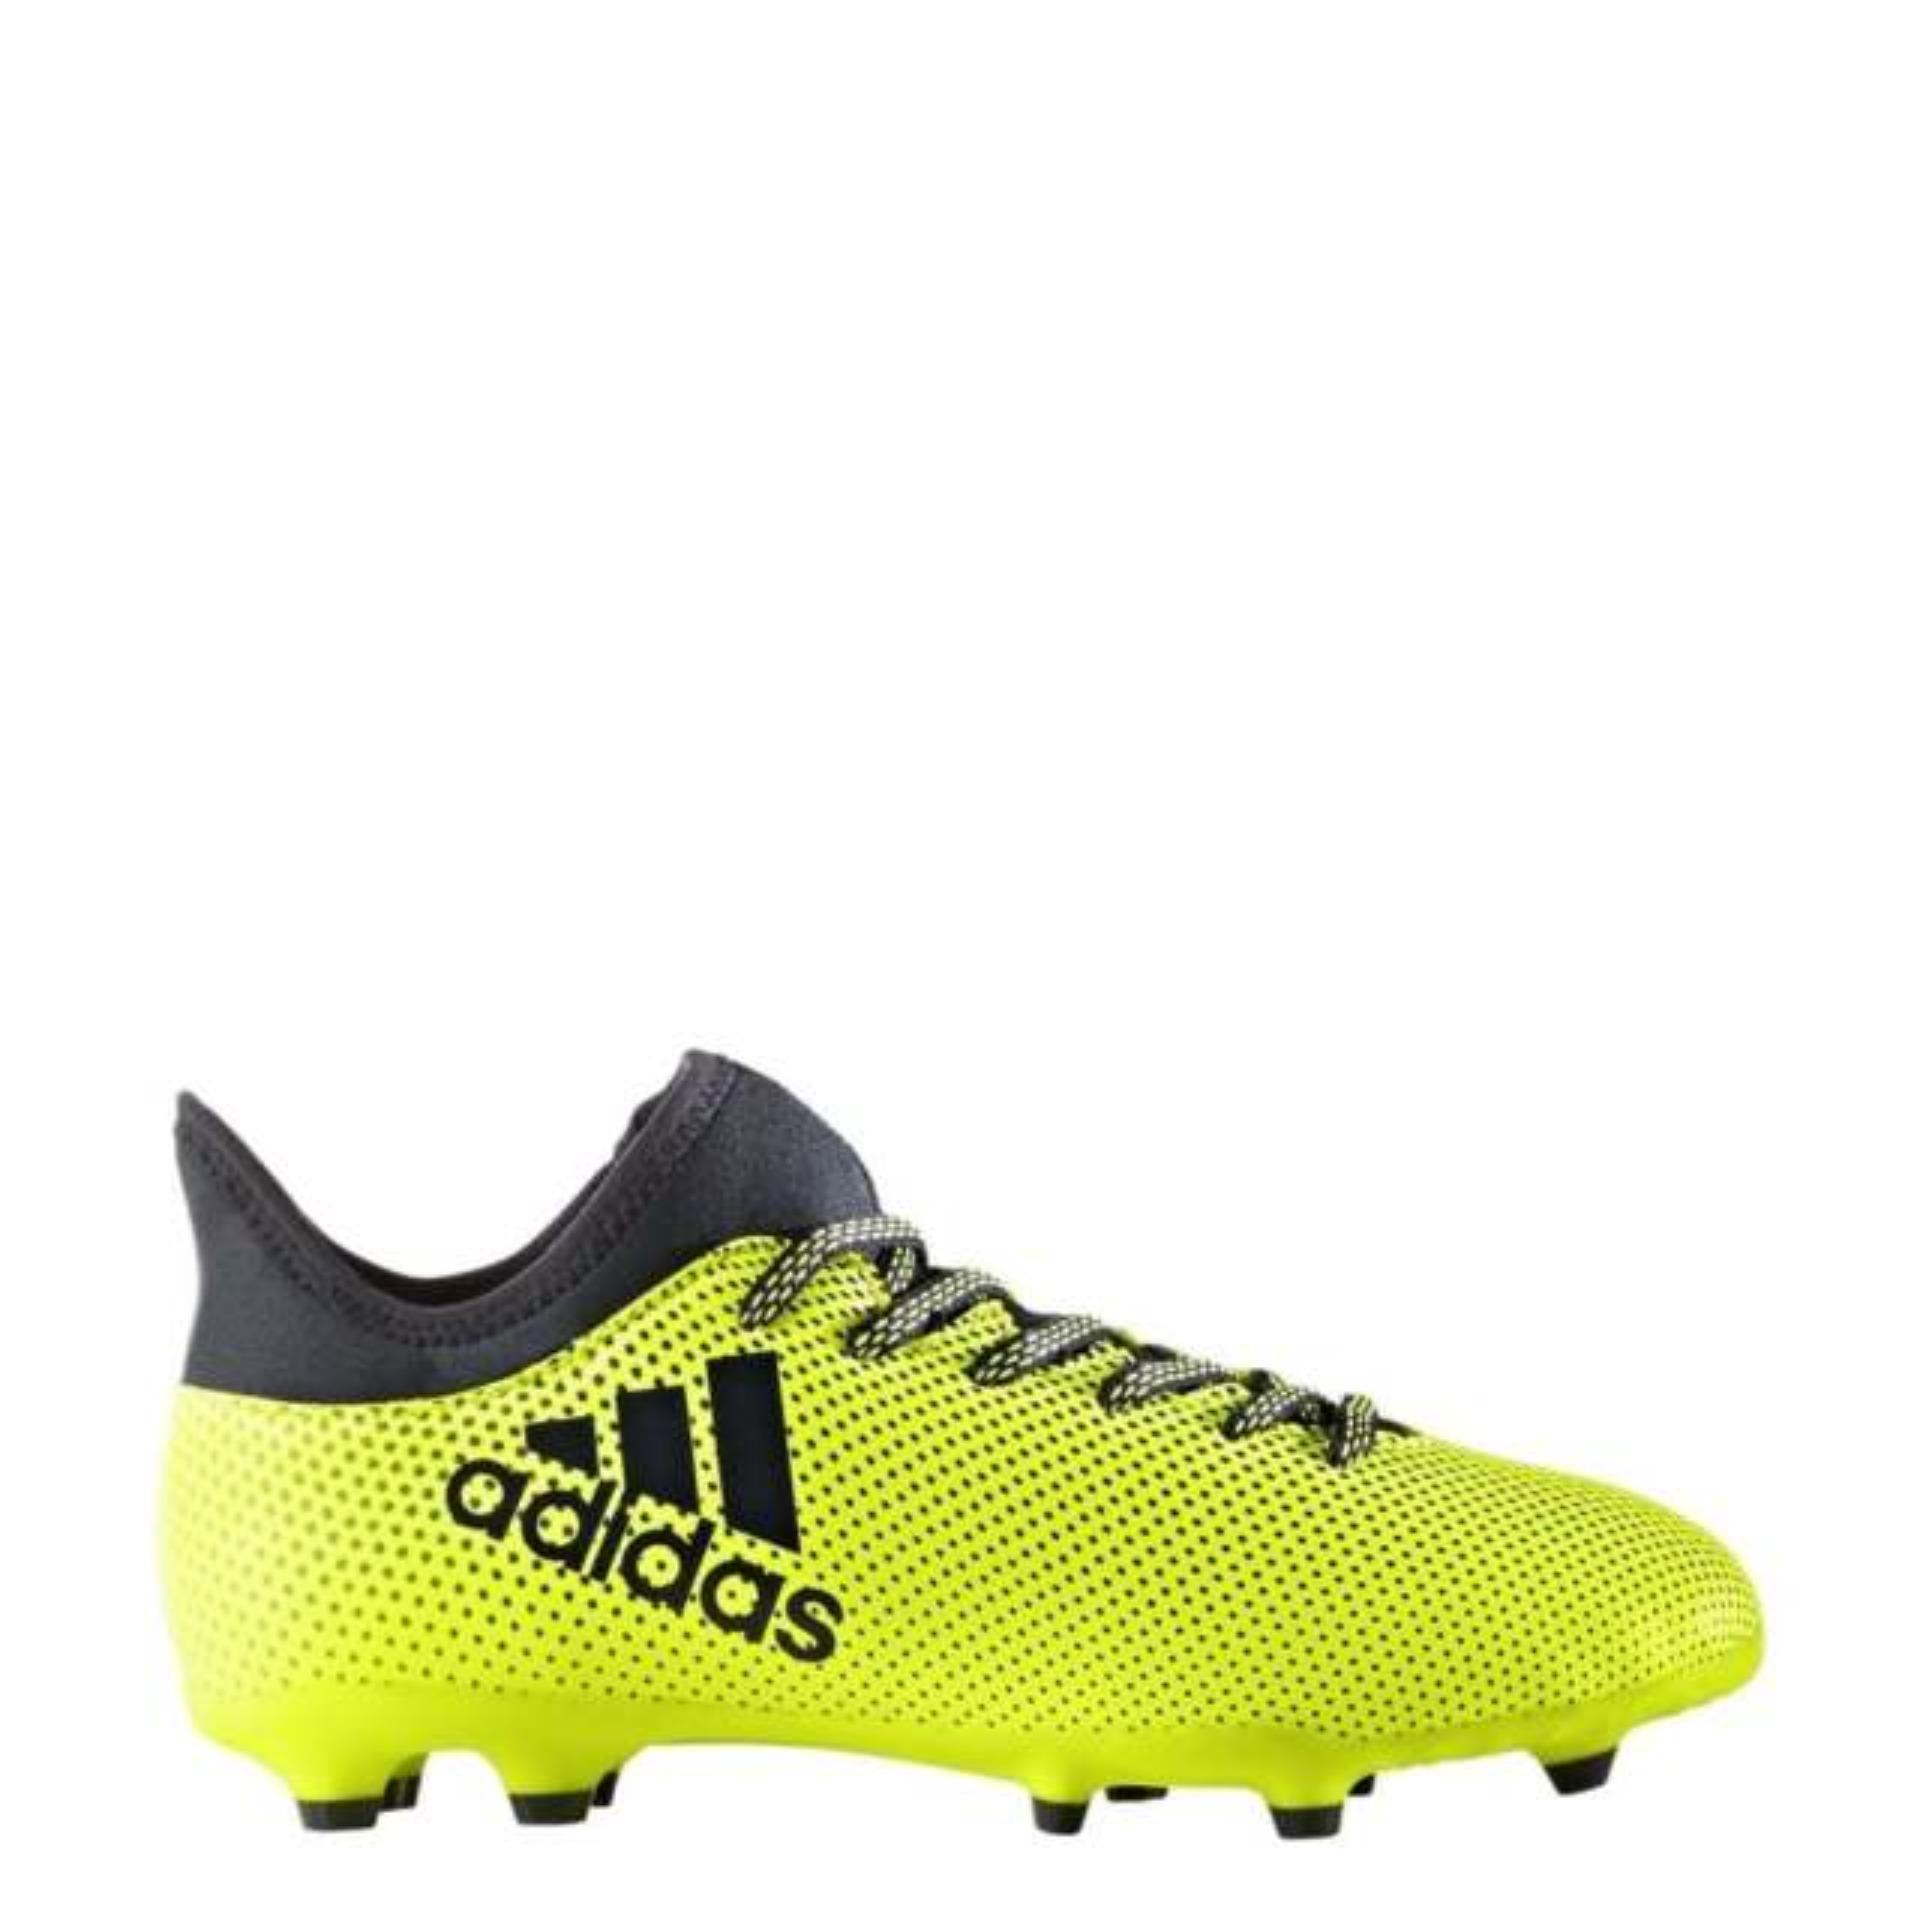 Adidas Sepatu Bola X 17.3 FG Jr - S82369